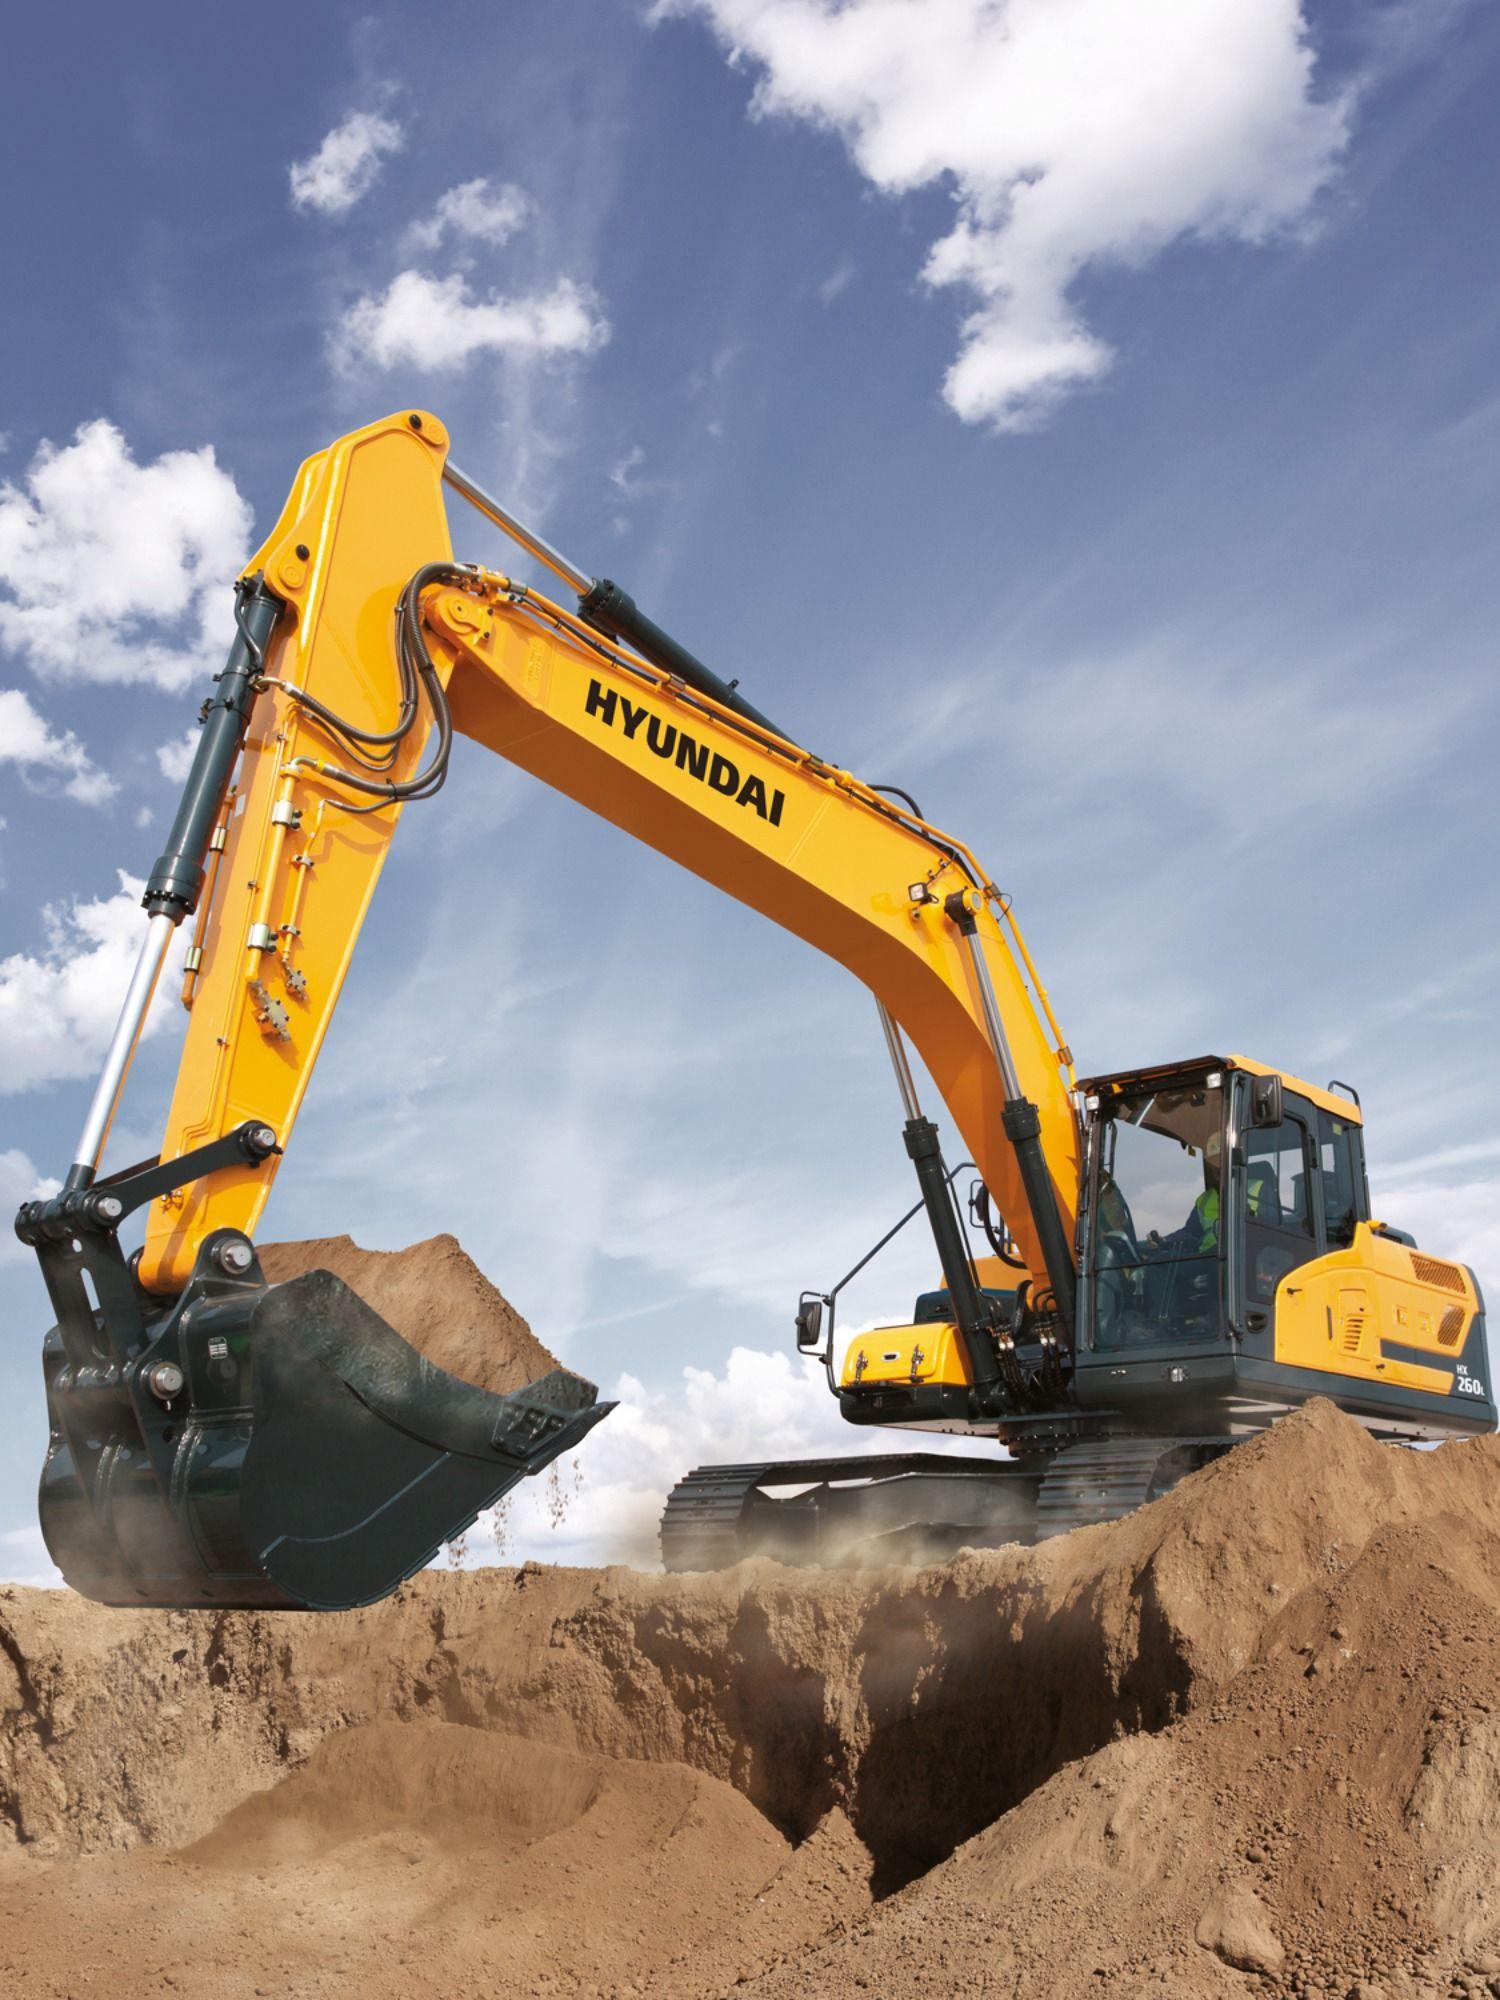 Hyundai Hx260l Crawler Excavator Heavy Construction Equipment Hyundai Construction